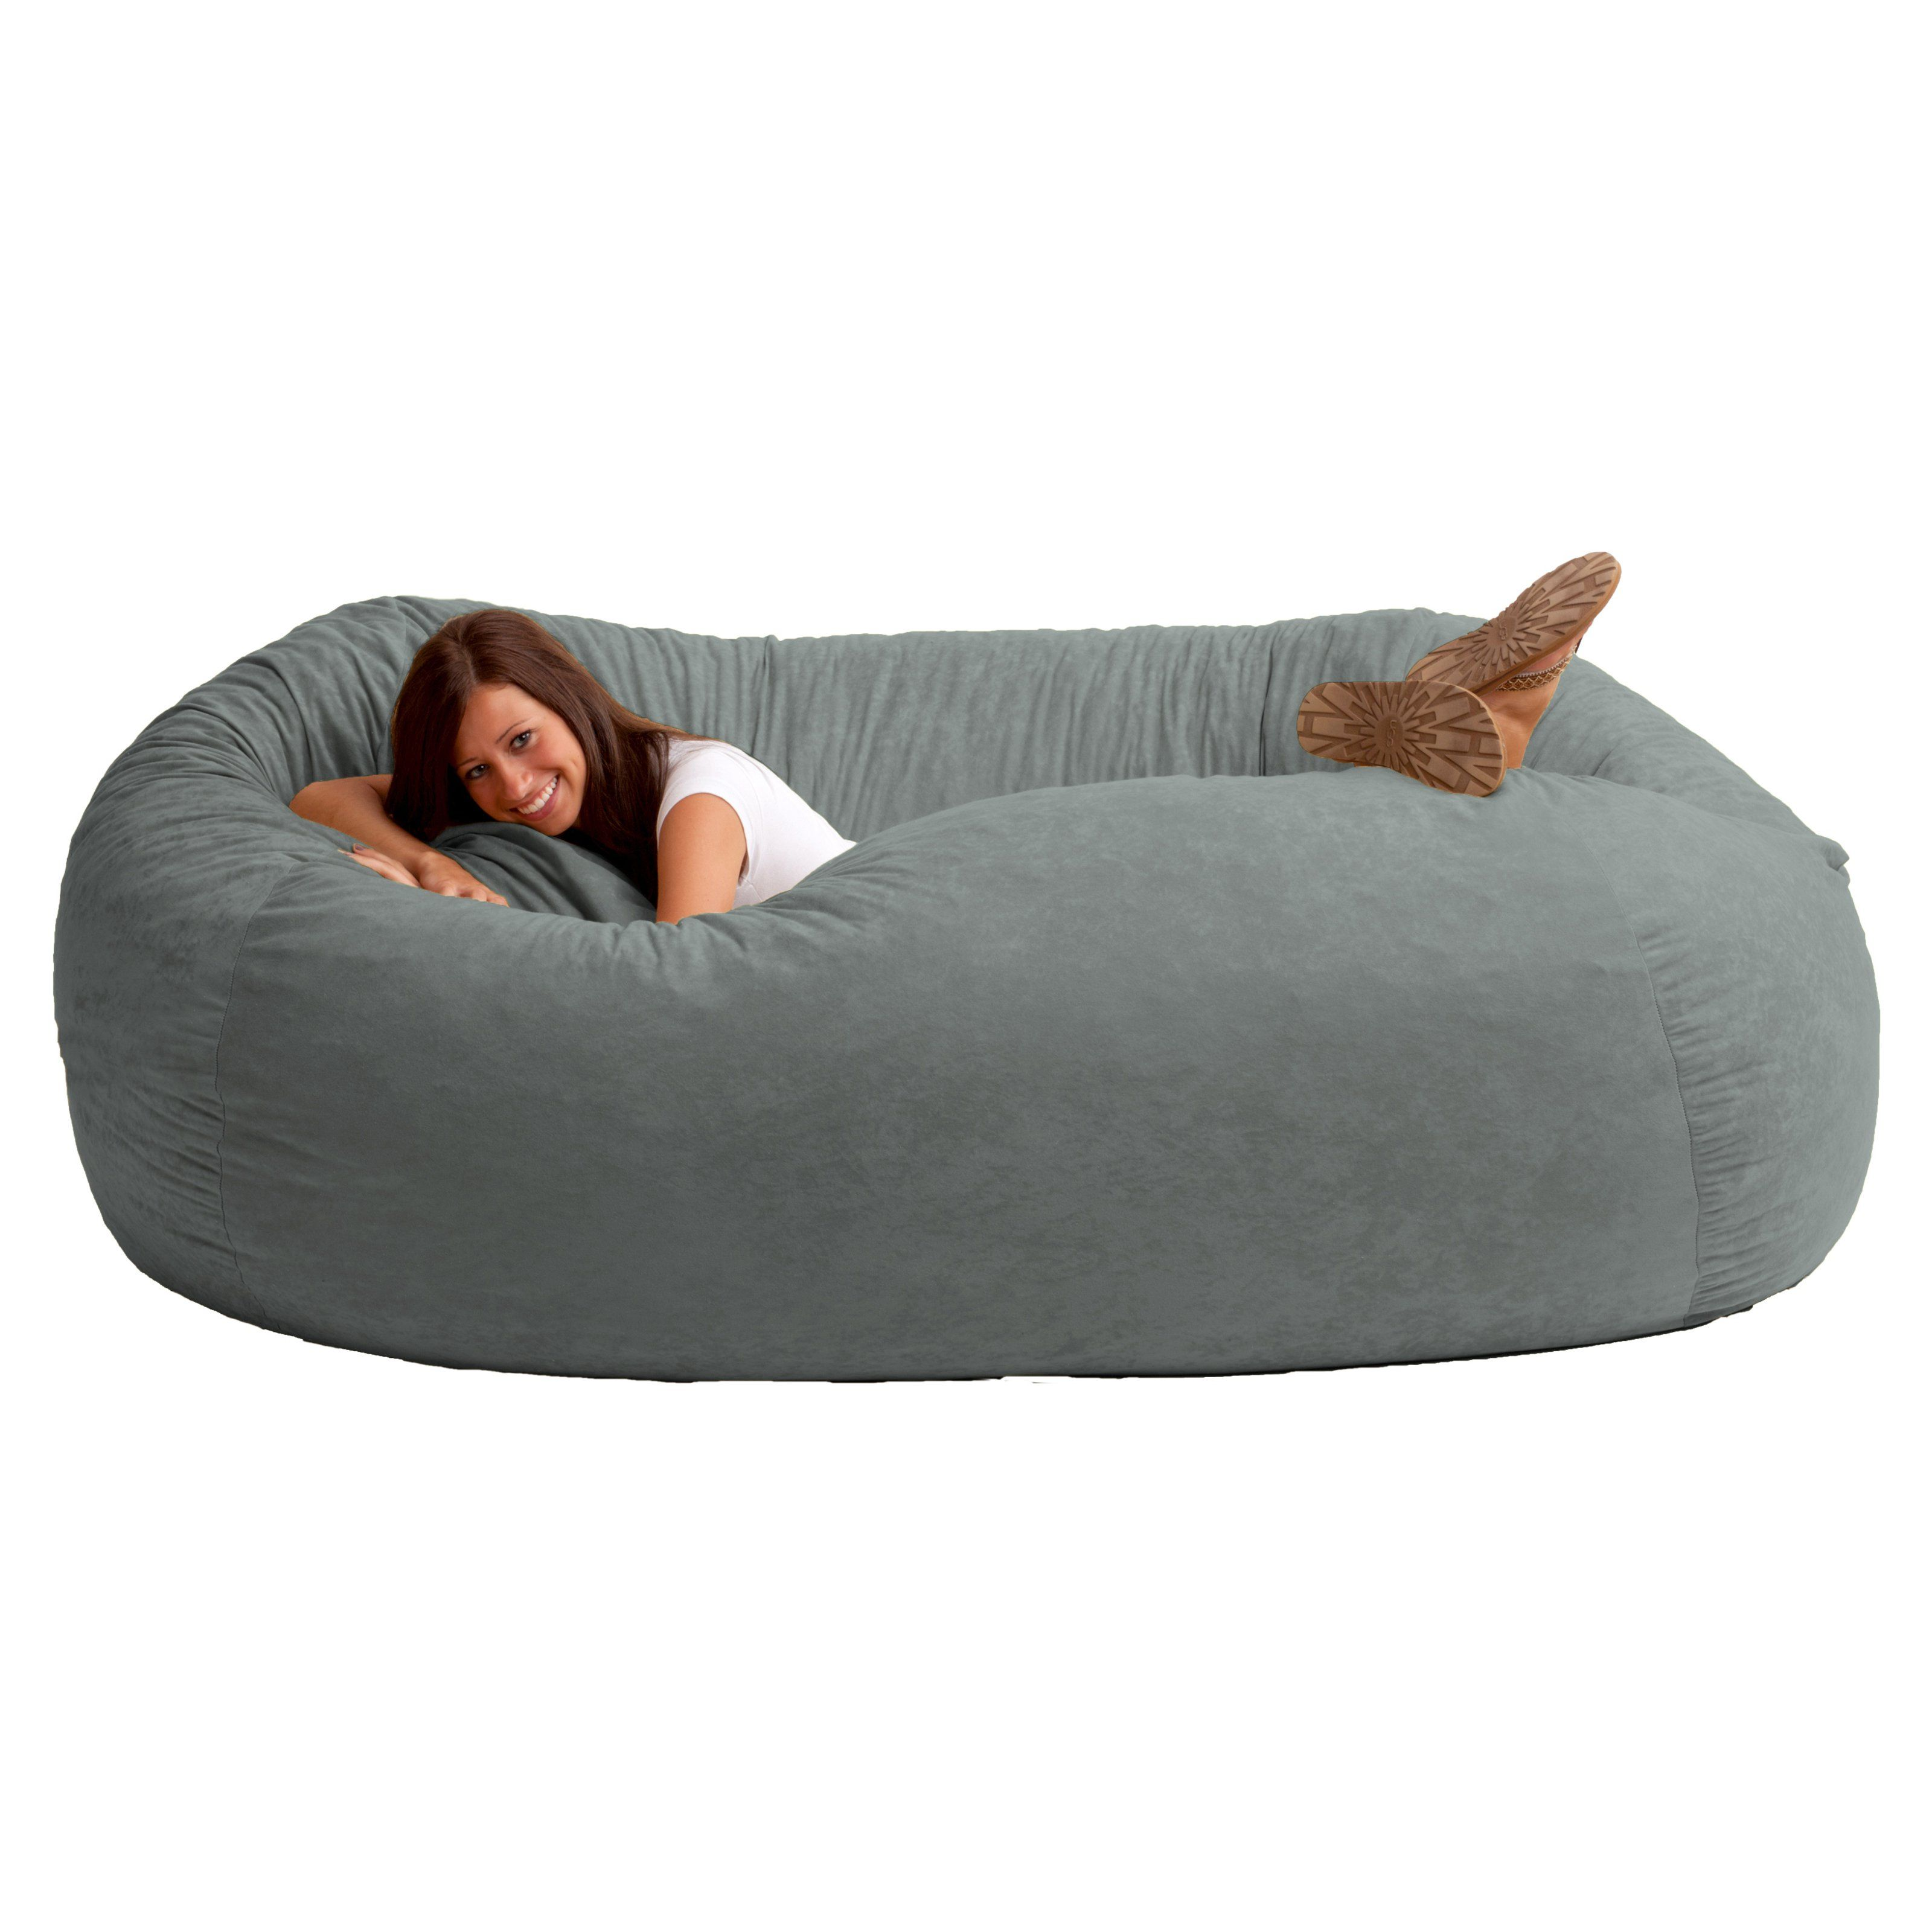 Buy Foam Filled Bean Bag Lounge Oversize memory foam beanbags for